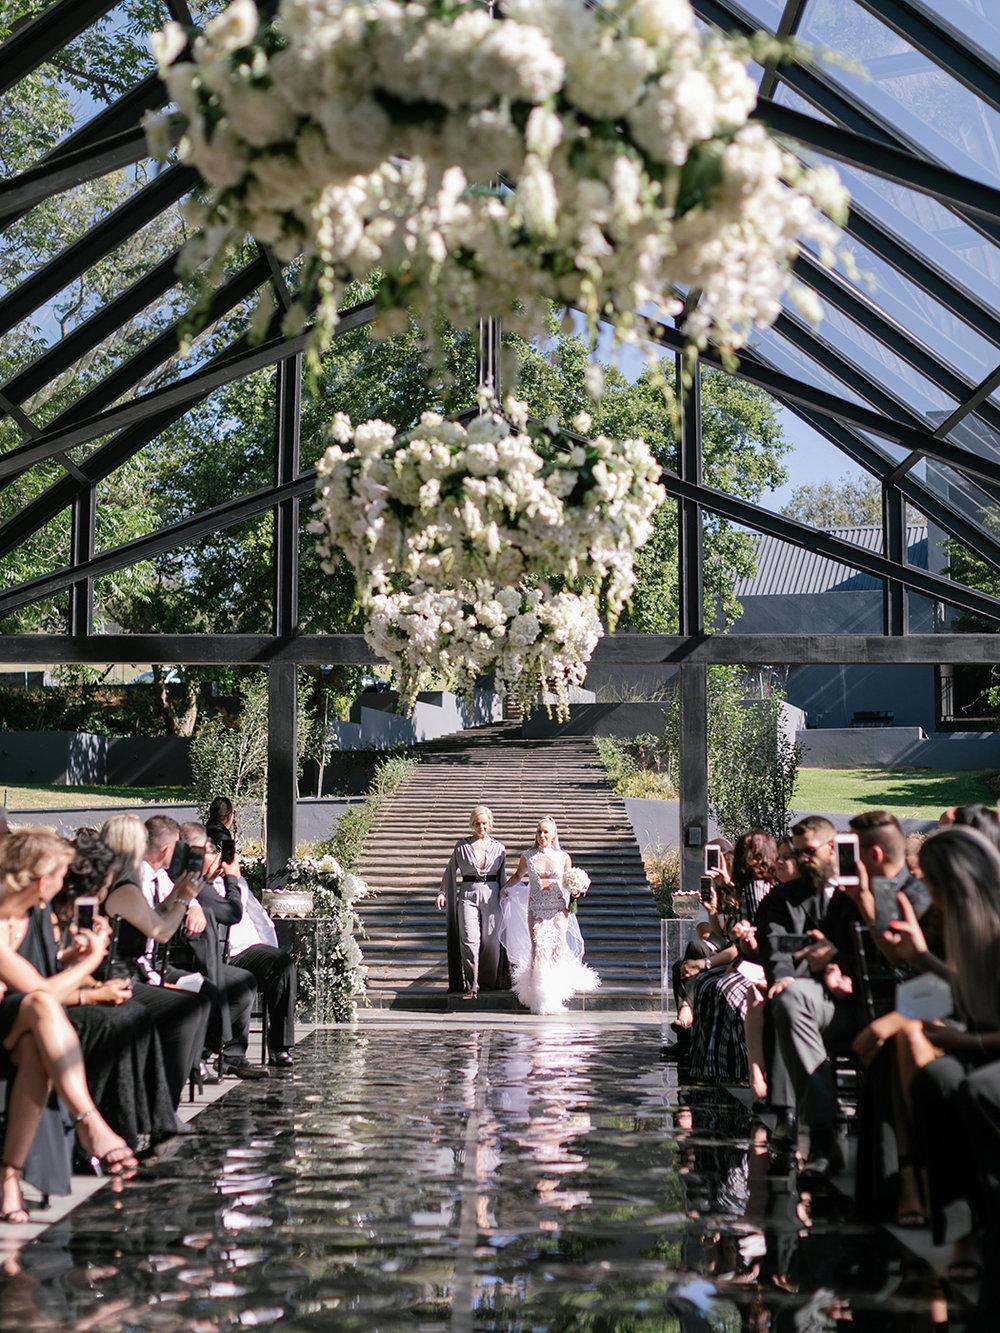 Bride Entrance | Rensche Mari Photography